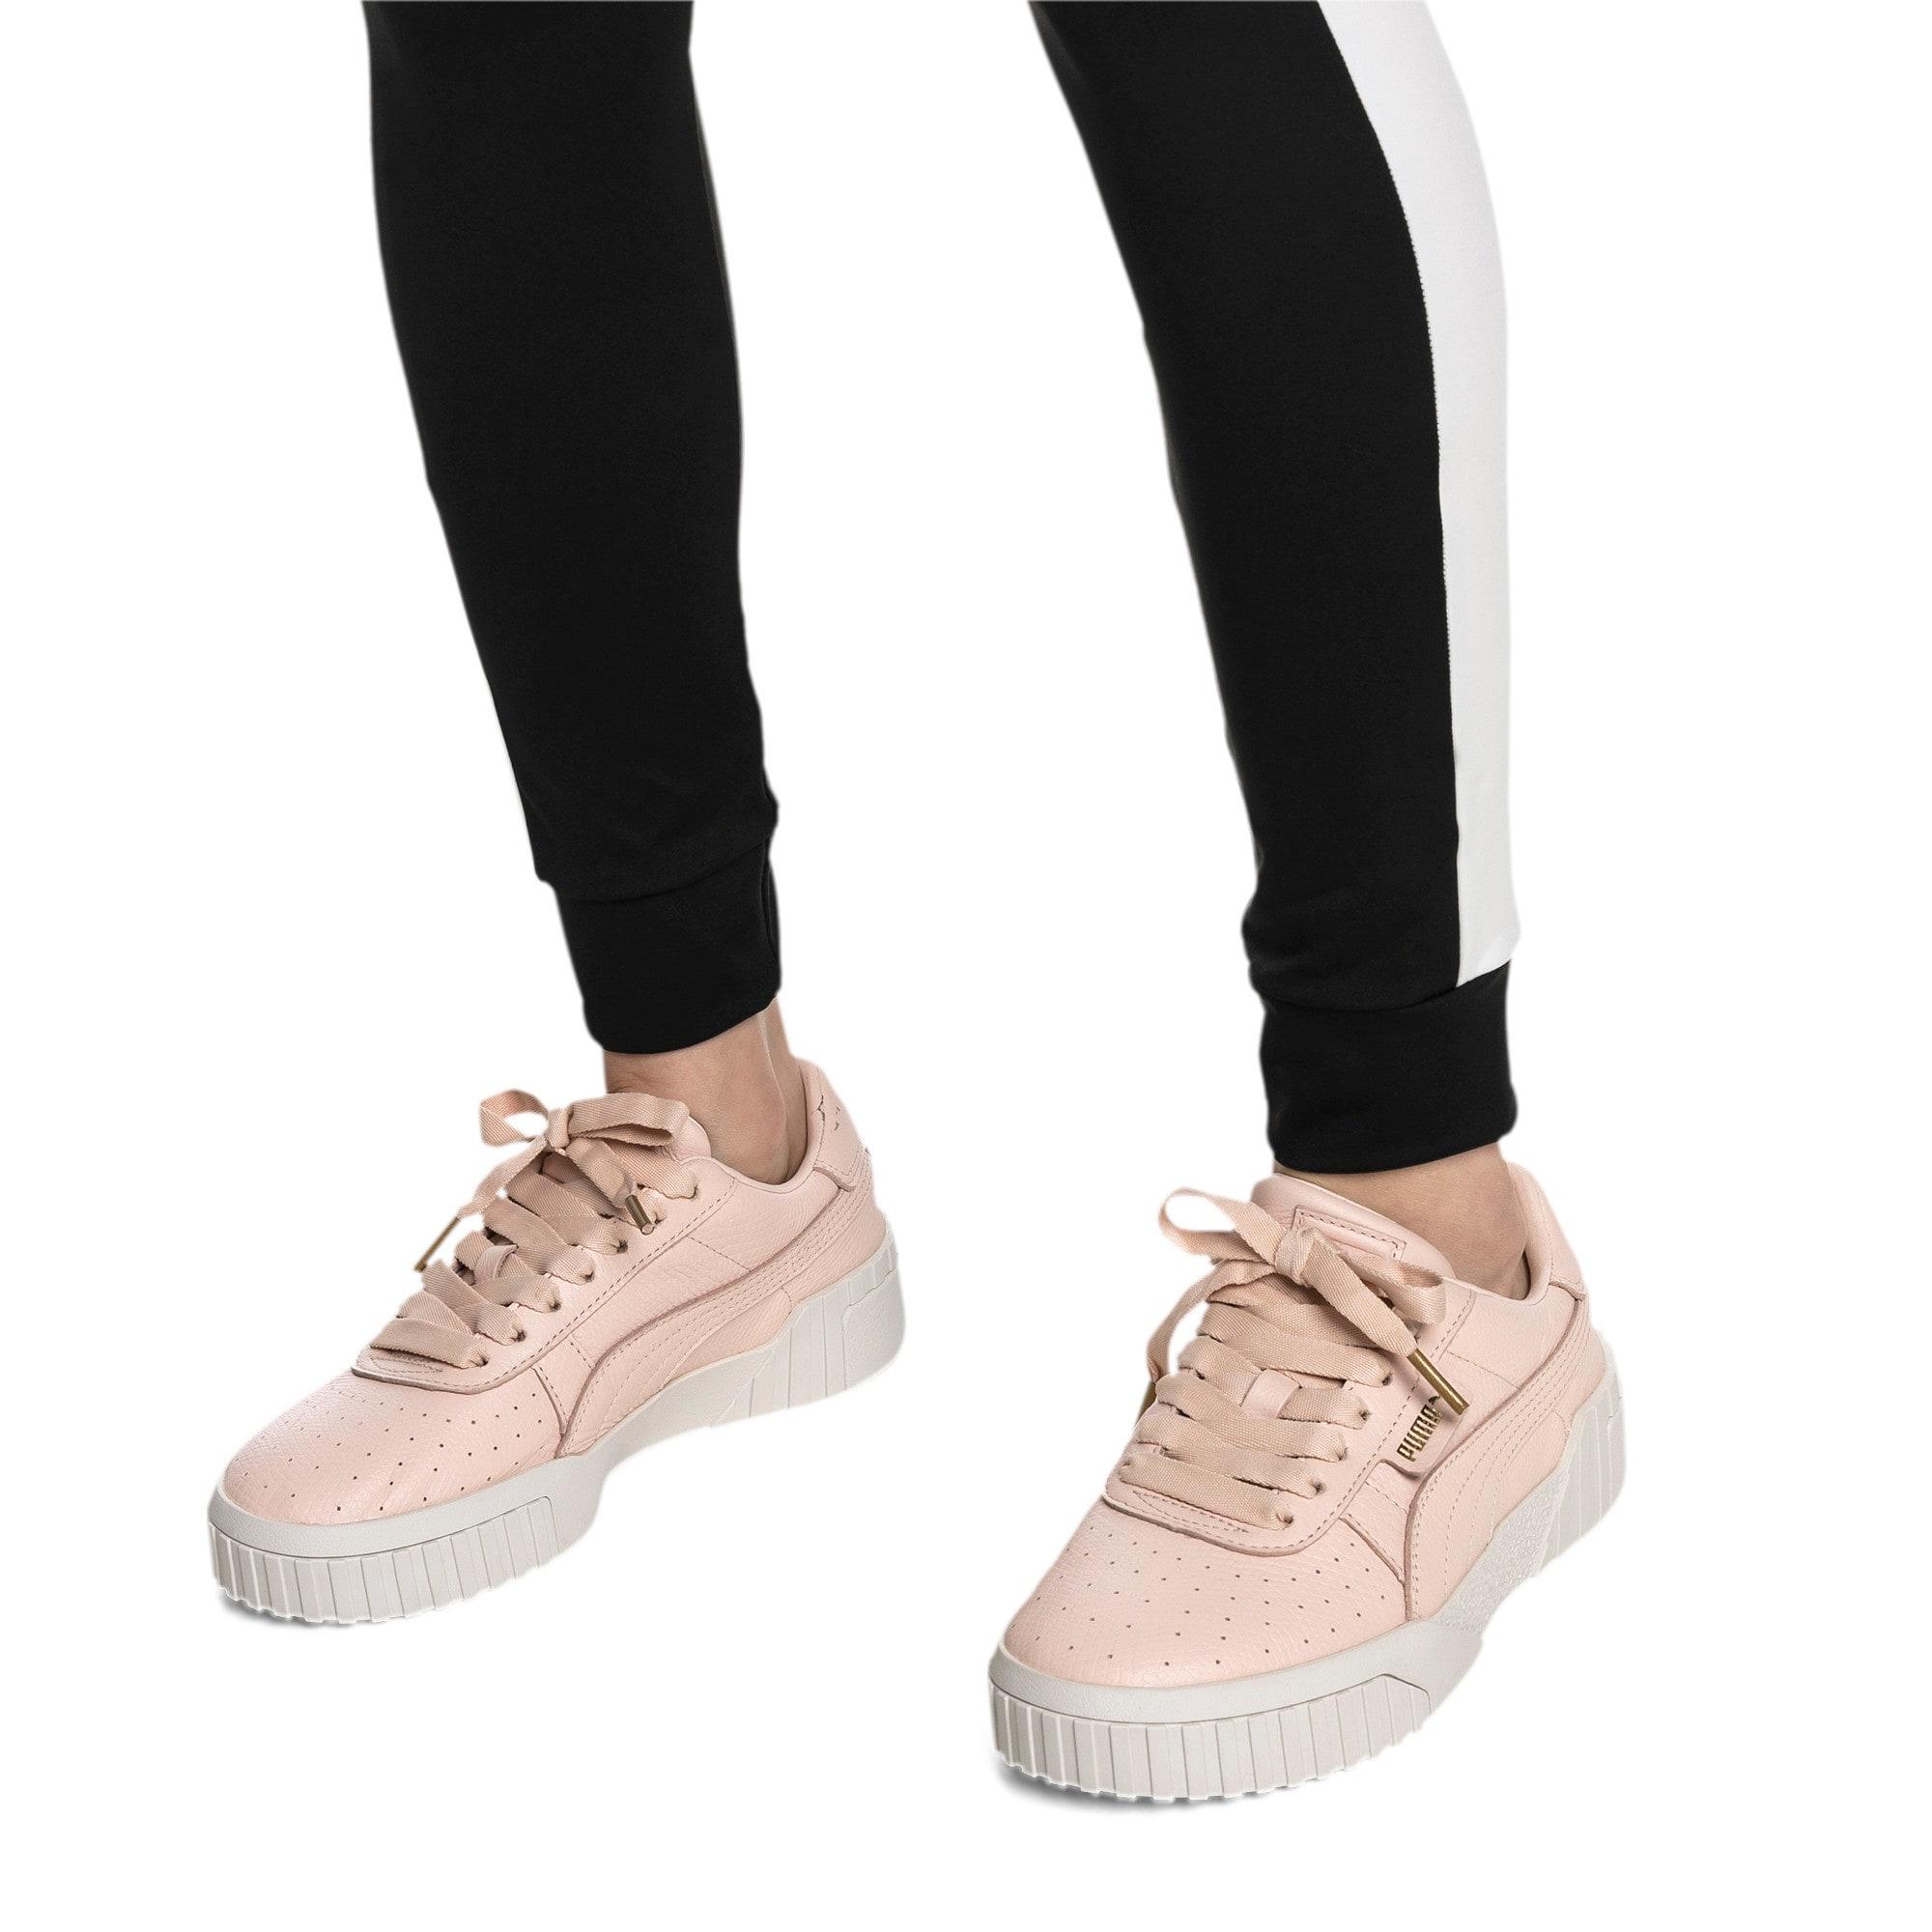 Thumbnail 2 of Cali Emboss Women's Sneakers, Cream Tan-Cream Tan, medium